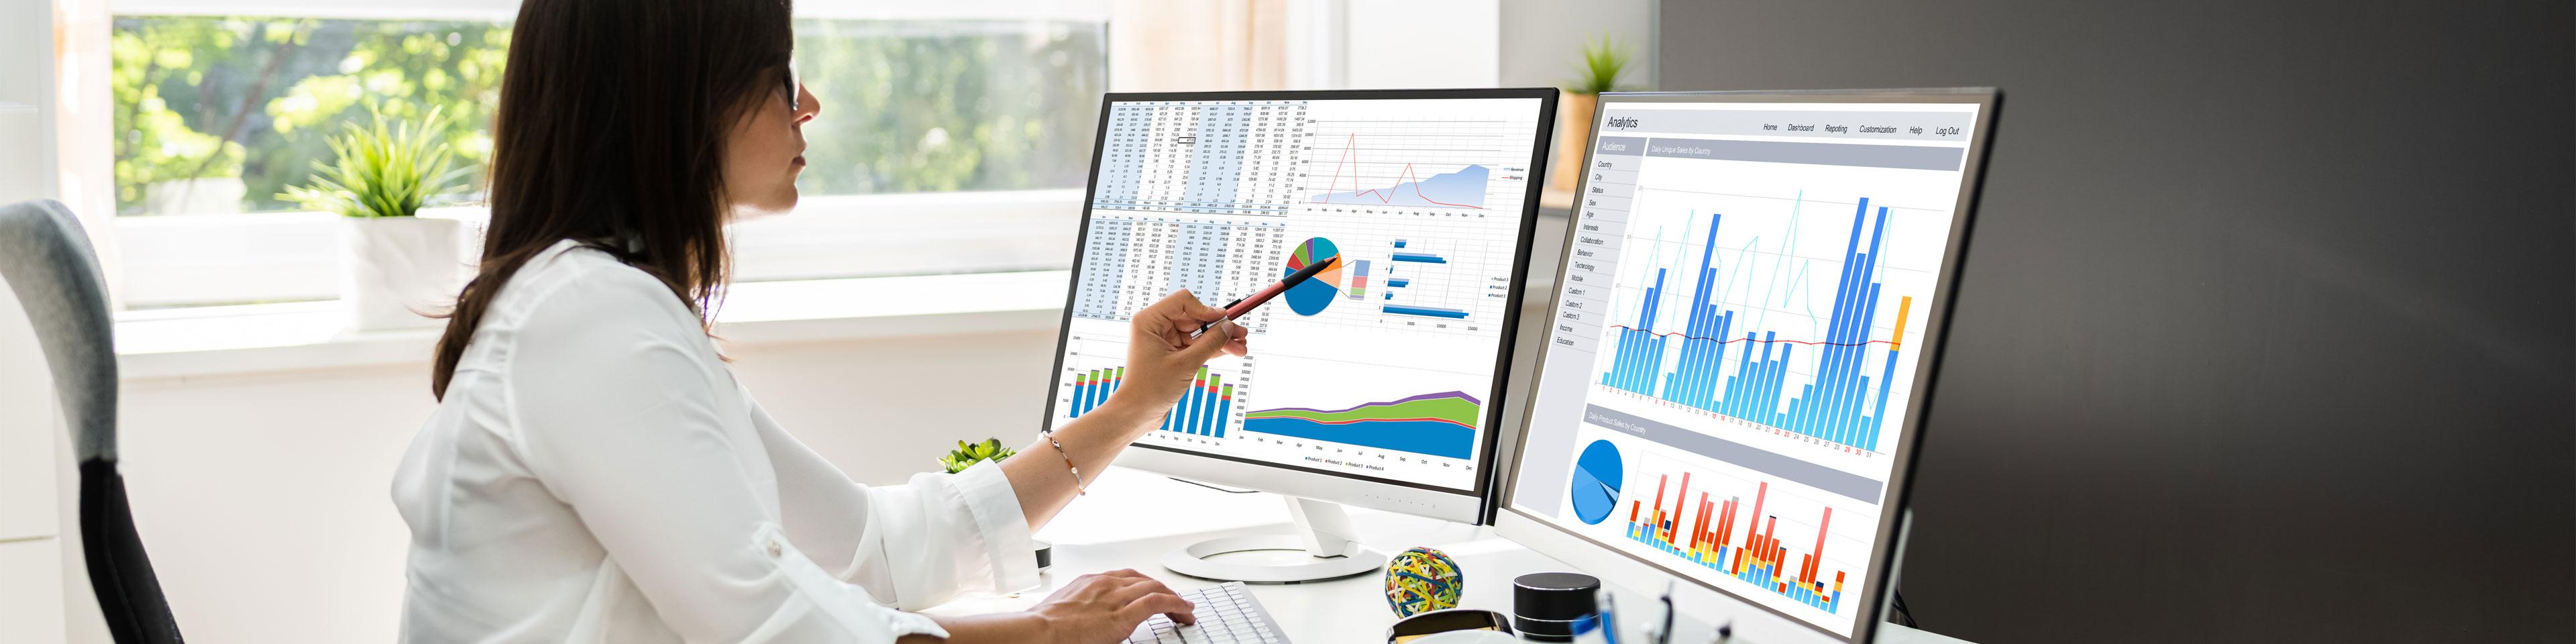 Data analytics key success factors